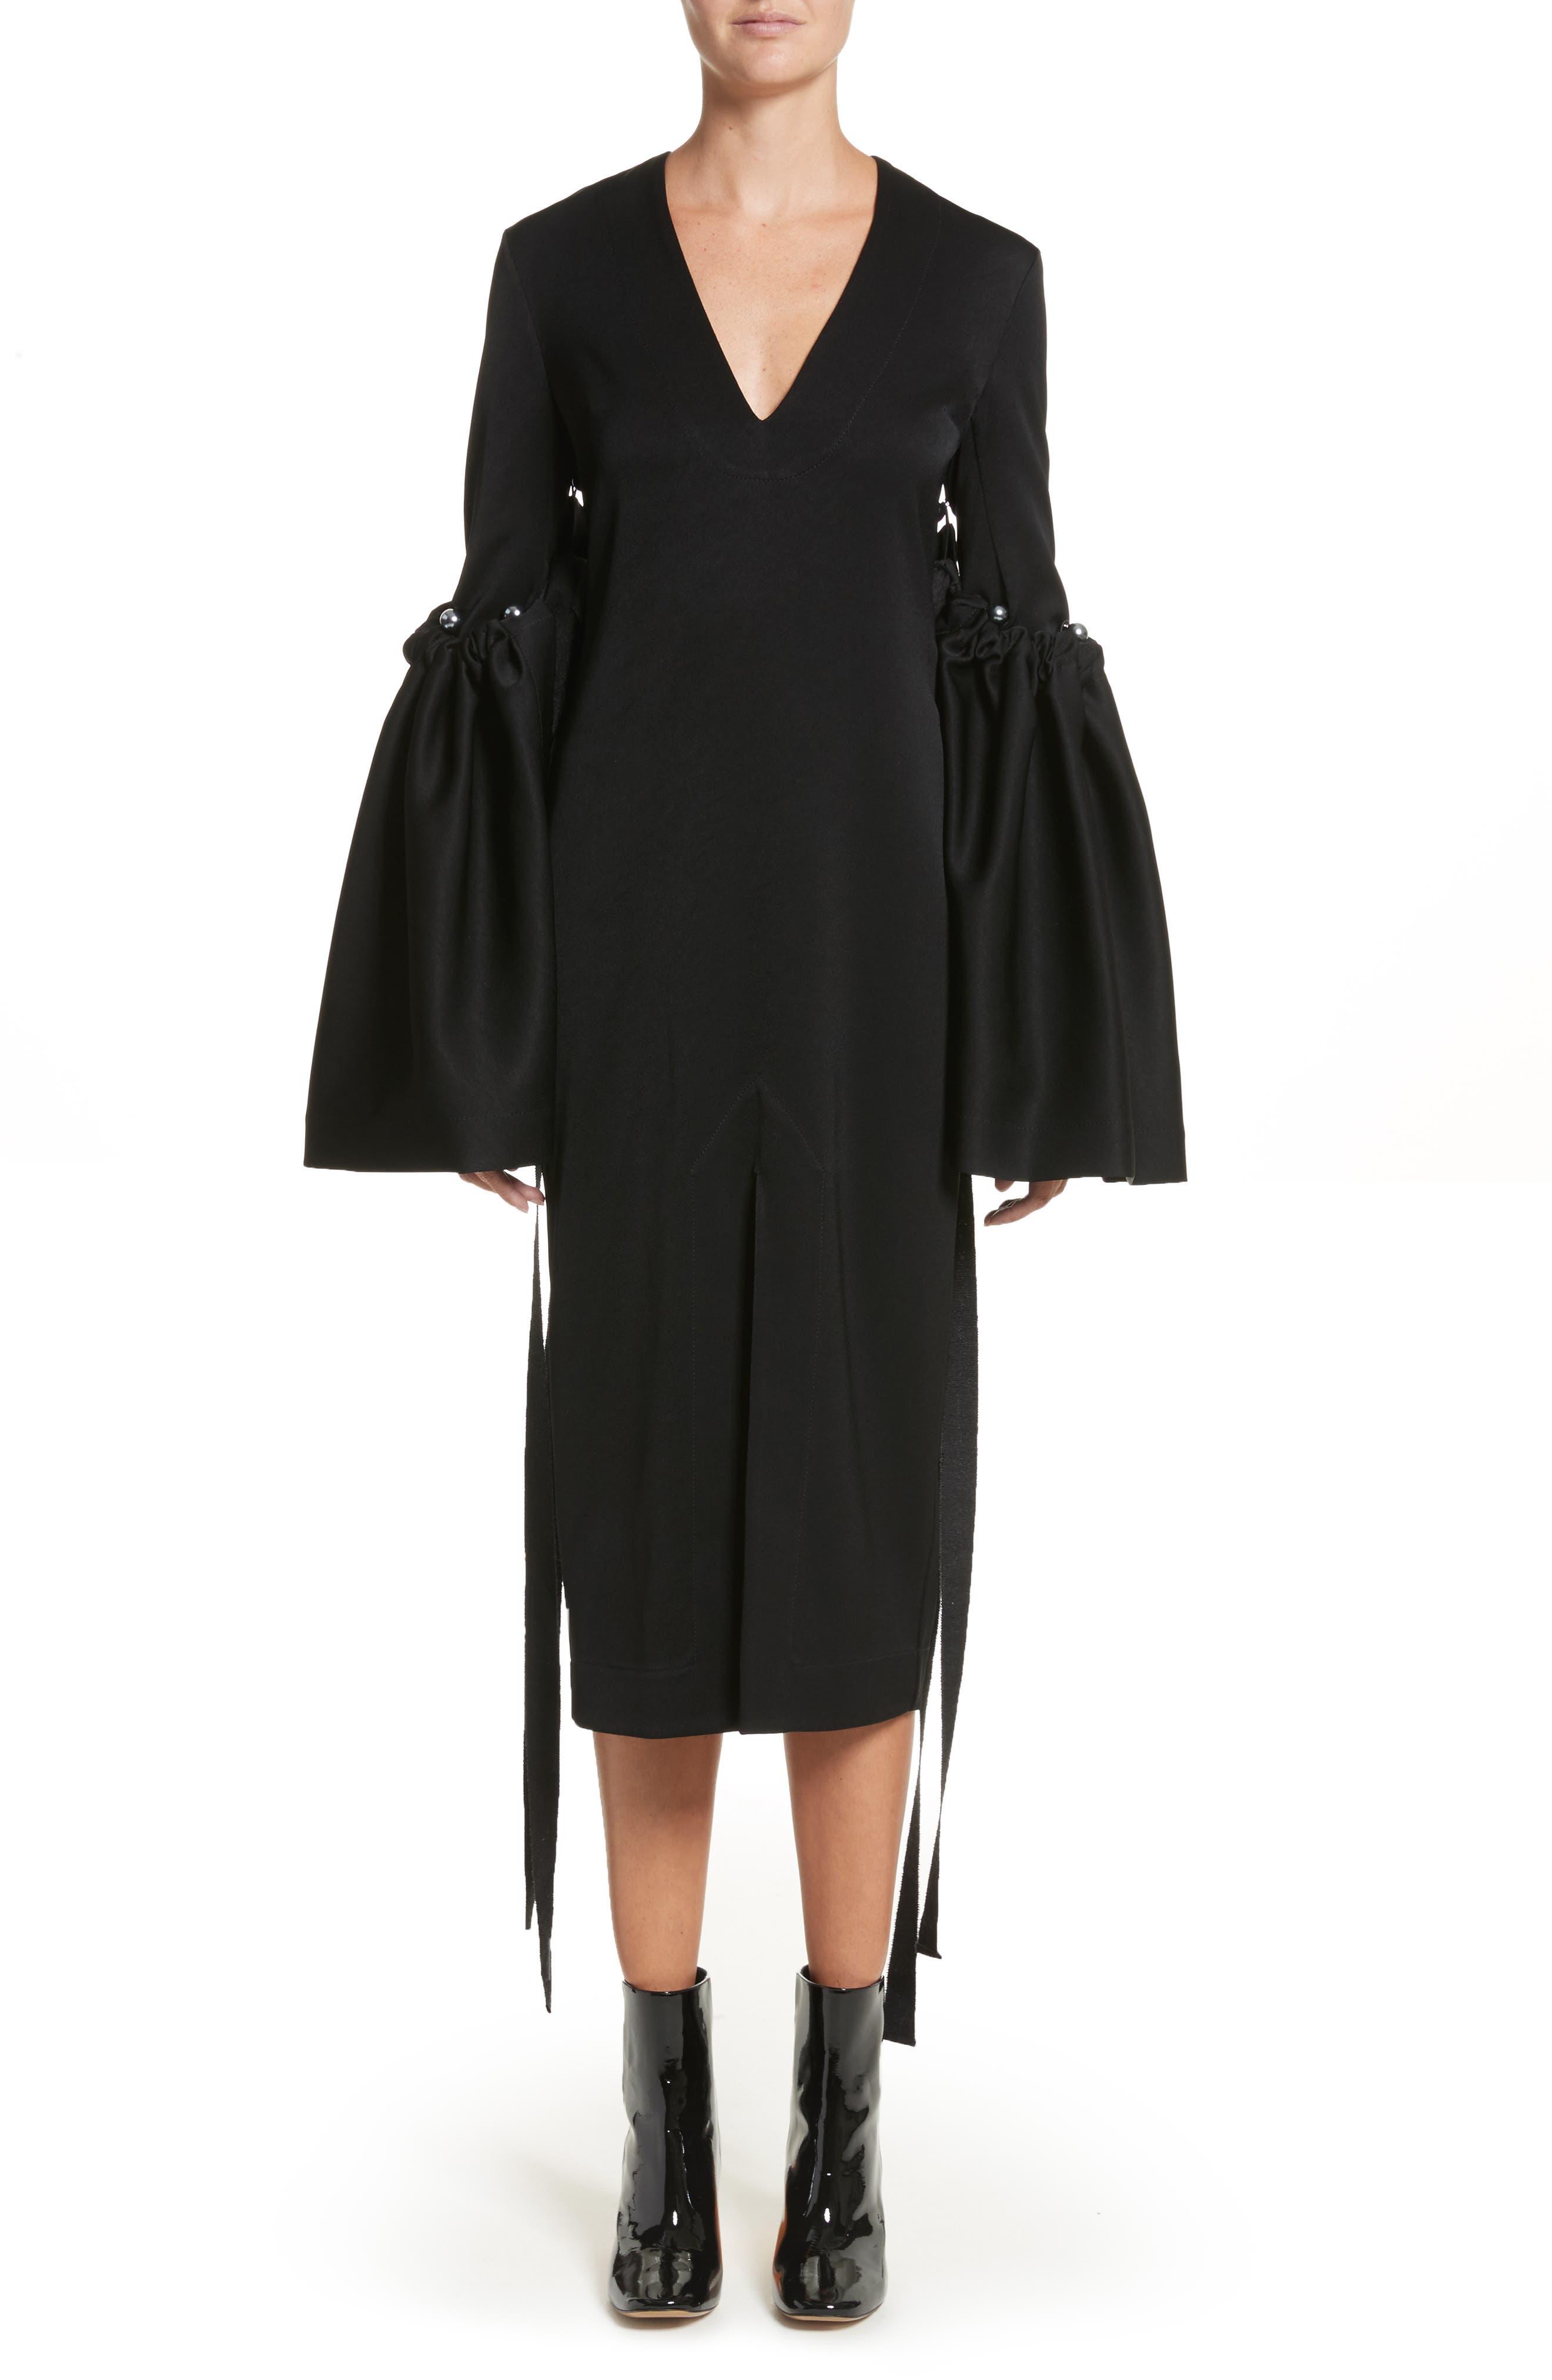 Adage Detachable Bell Sleeve Dress,                             Main thumbnail 1, color,                             001